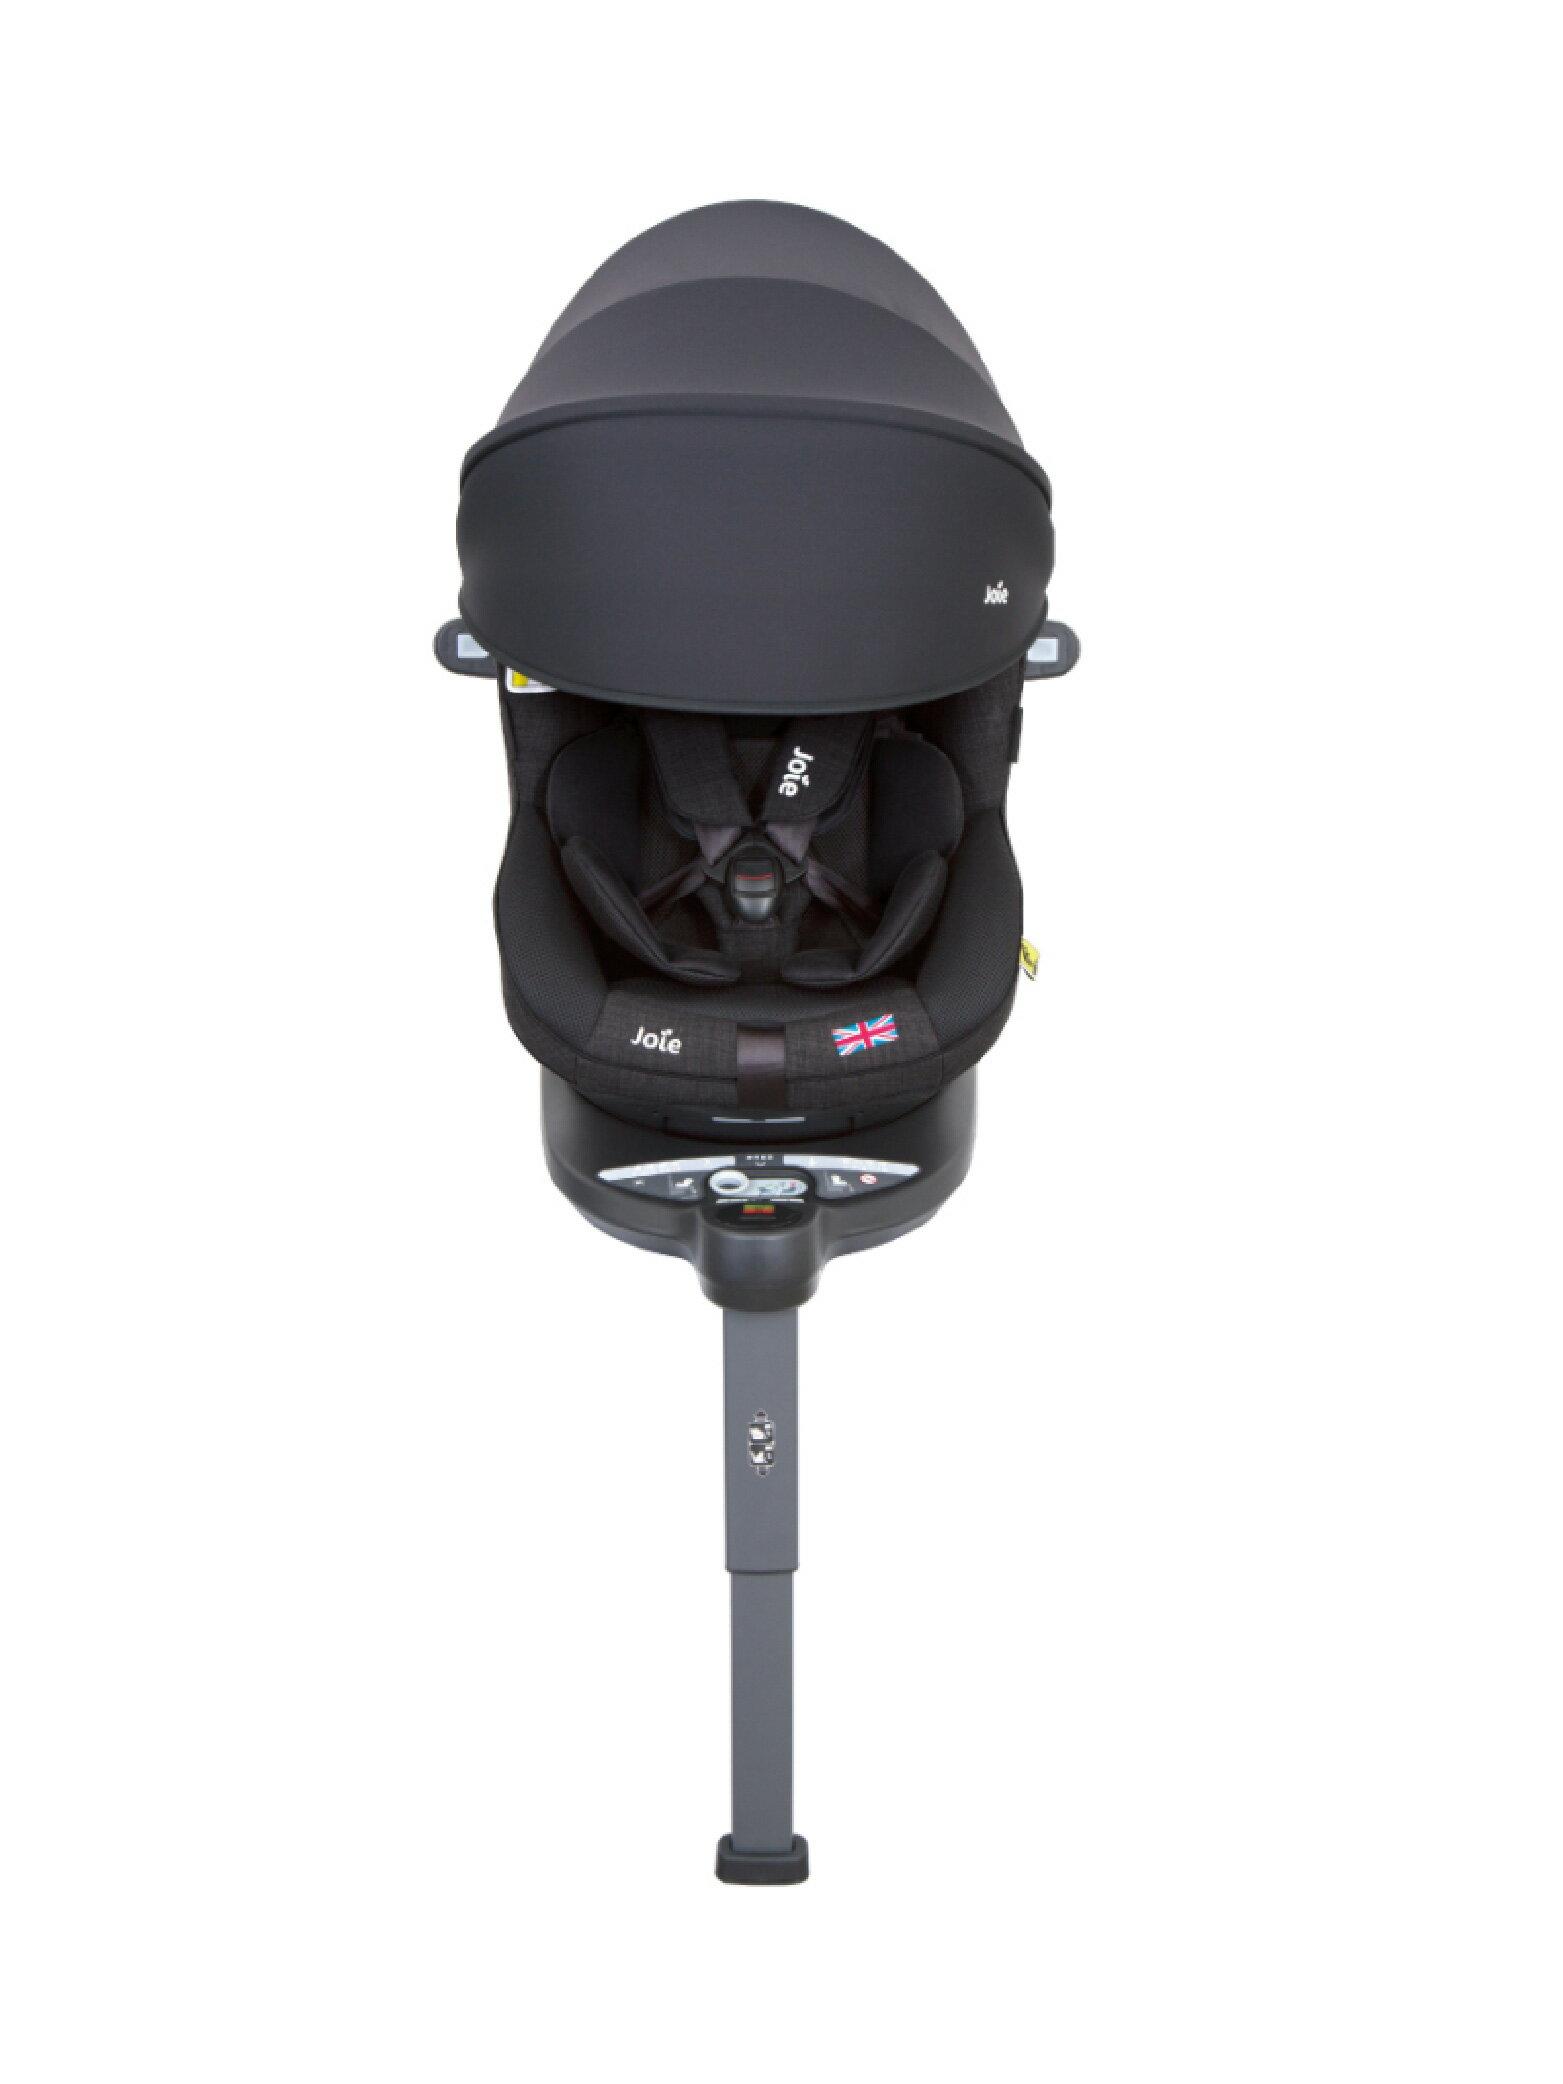 英國 Joie I-spin Canopy 汽車安全座椅-頂篷款 (0-4y)